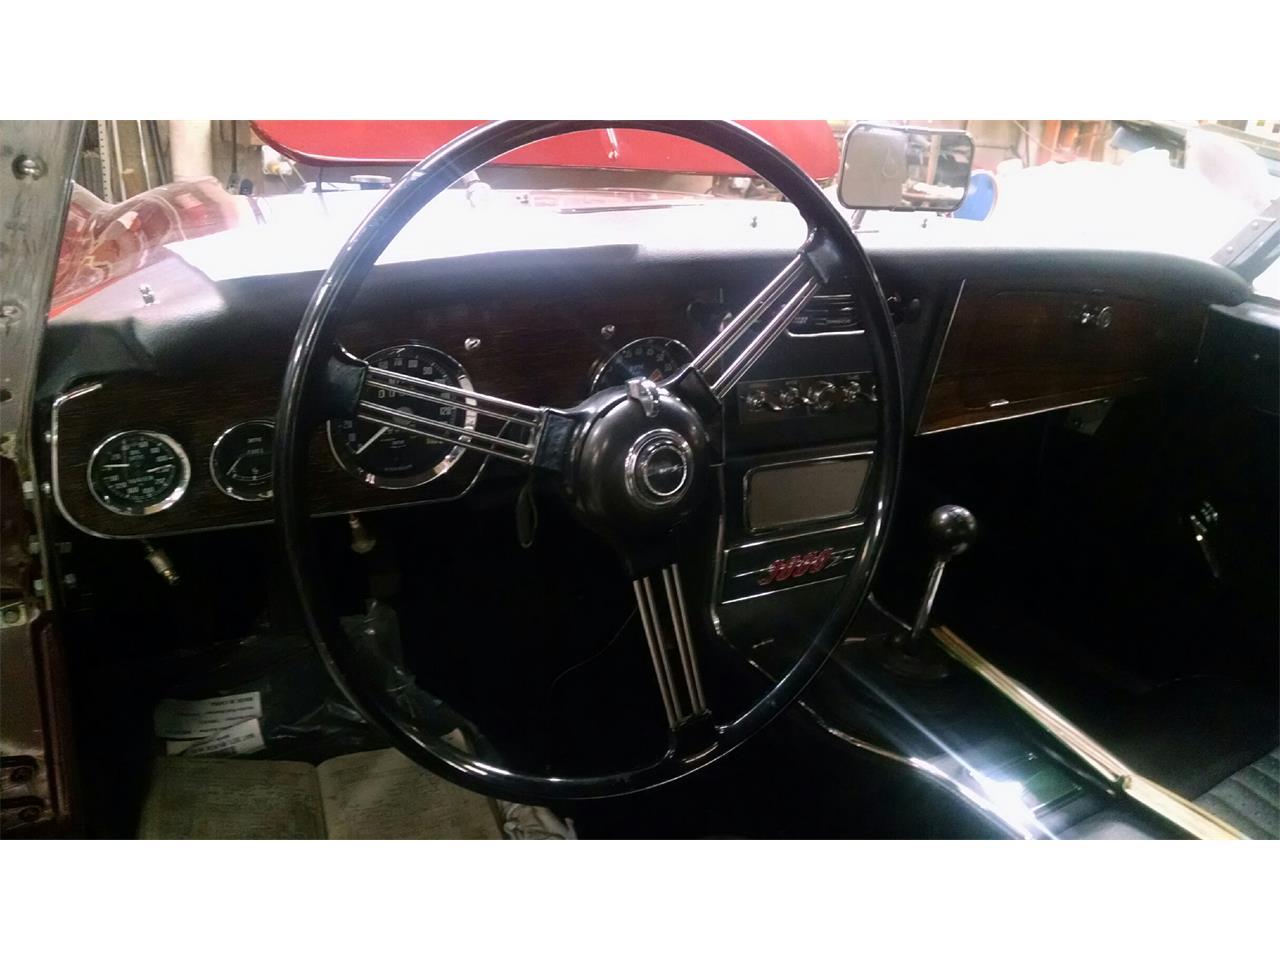 1967 Austin-Healey 3000 Mark III BJ8 (CC-1269823) for sale in Elkhart, Indiana